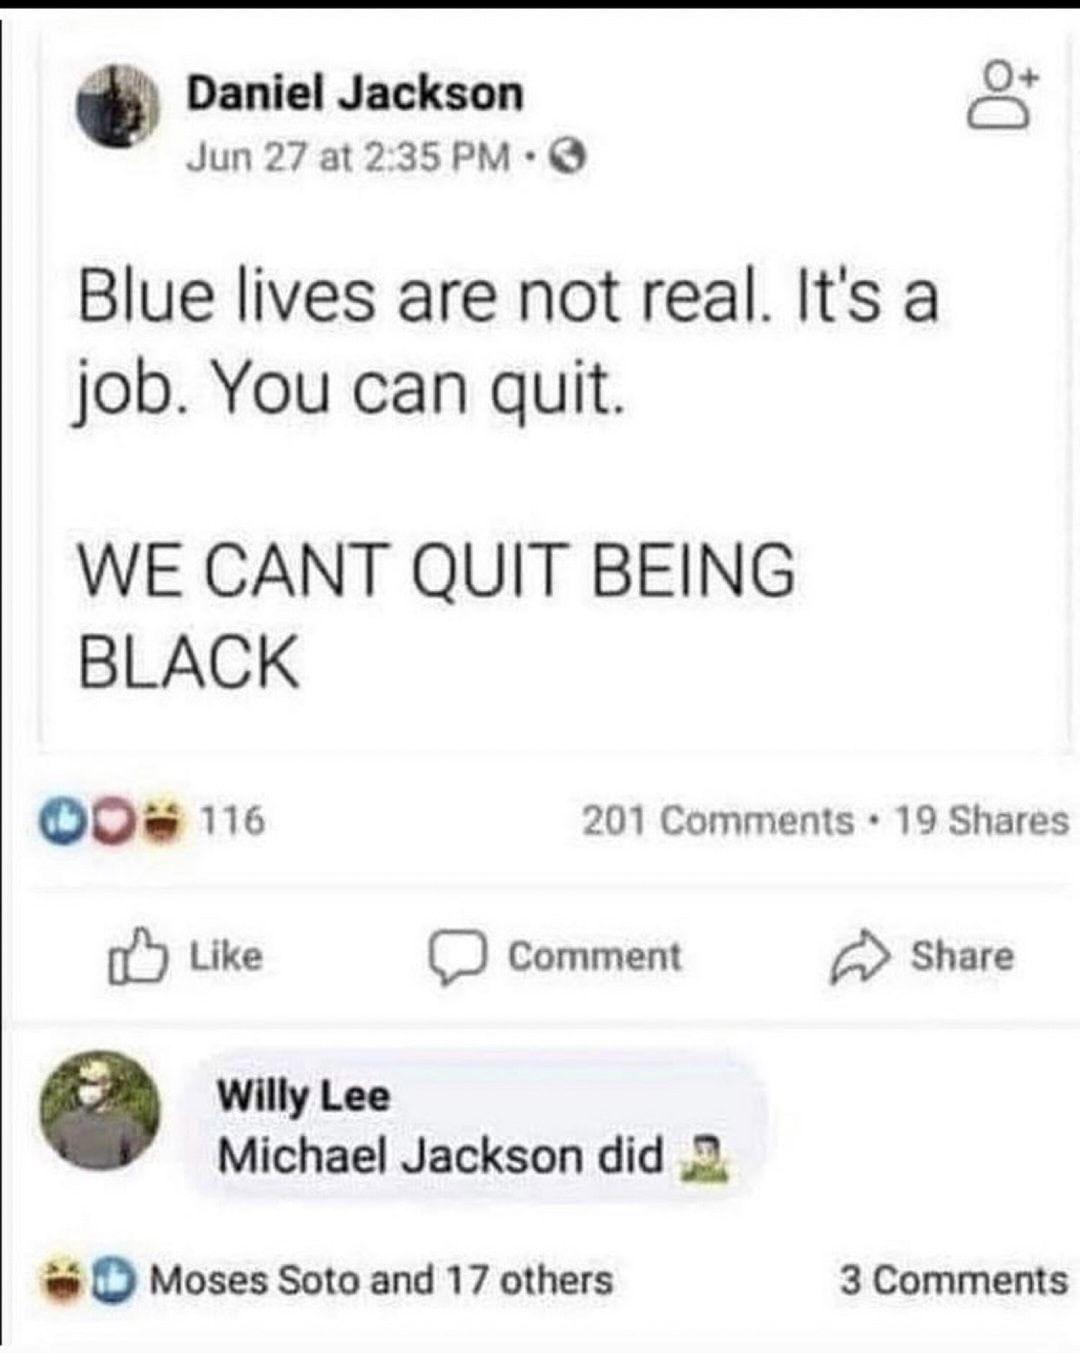 He really did